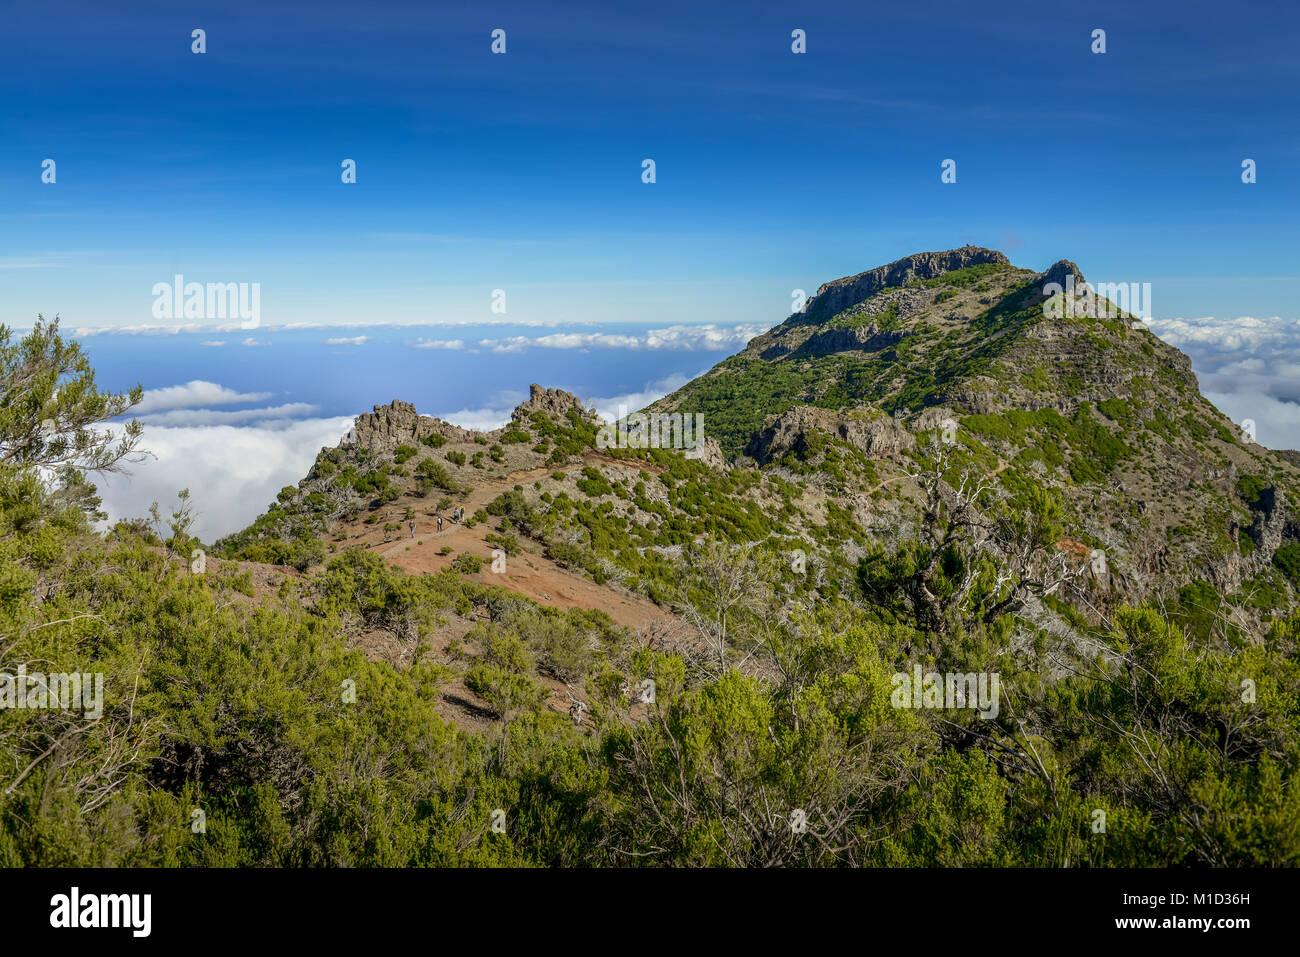 Mountain landscape of the Pico Ruivo, Central Mountains, Madeira, Portugal, Berglandschaft am Pico Ruivo, Zentralgebirge - Stock Image